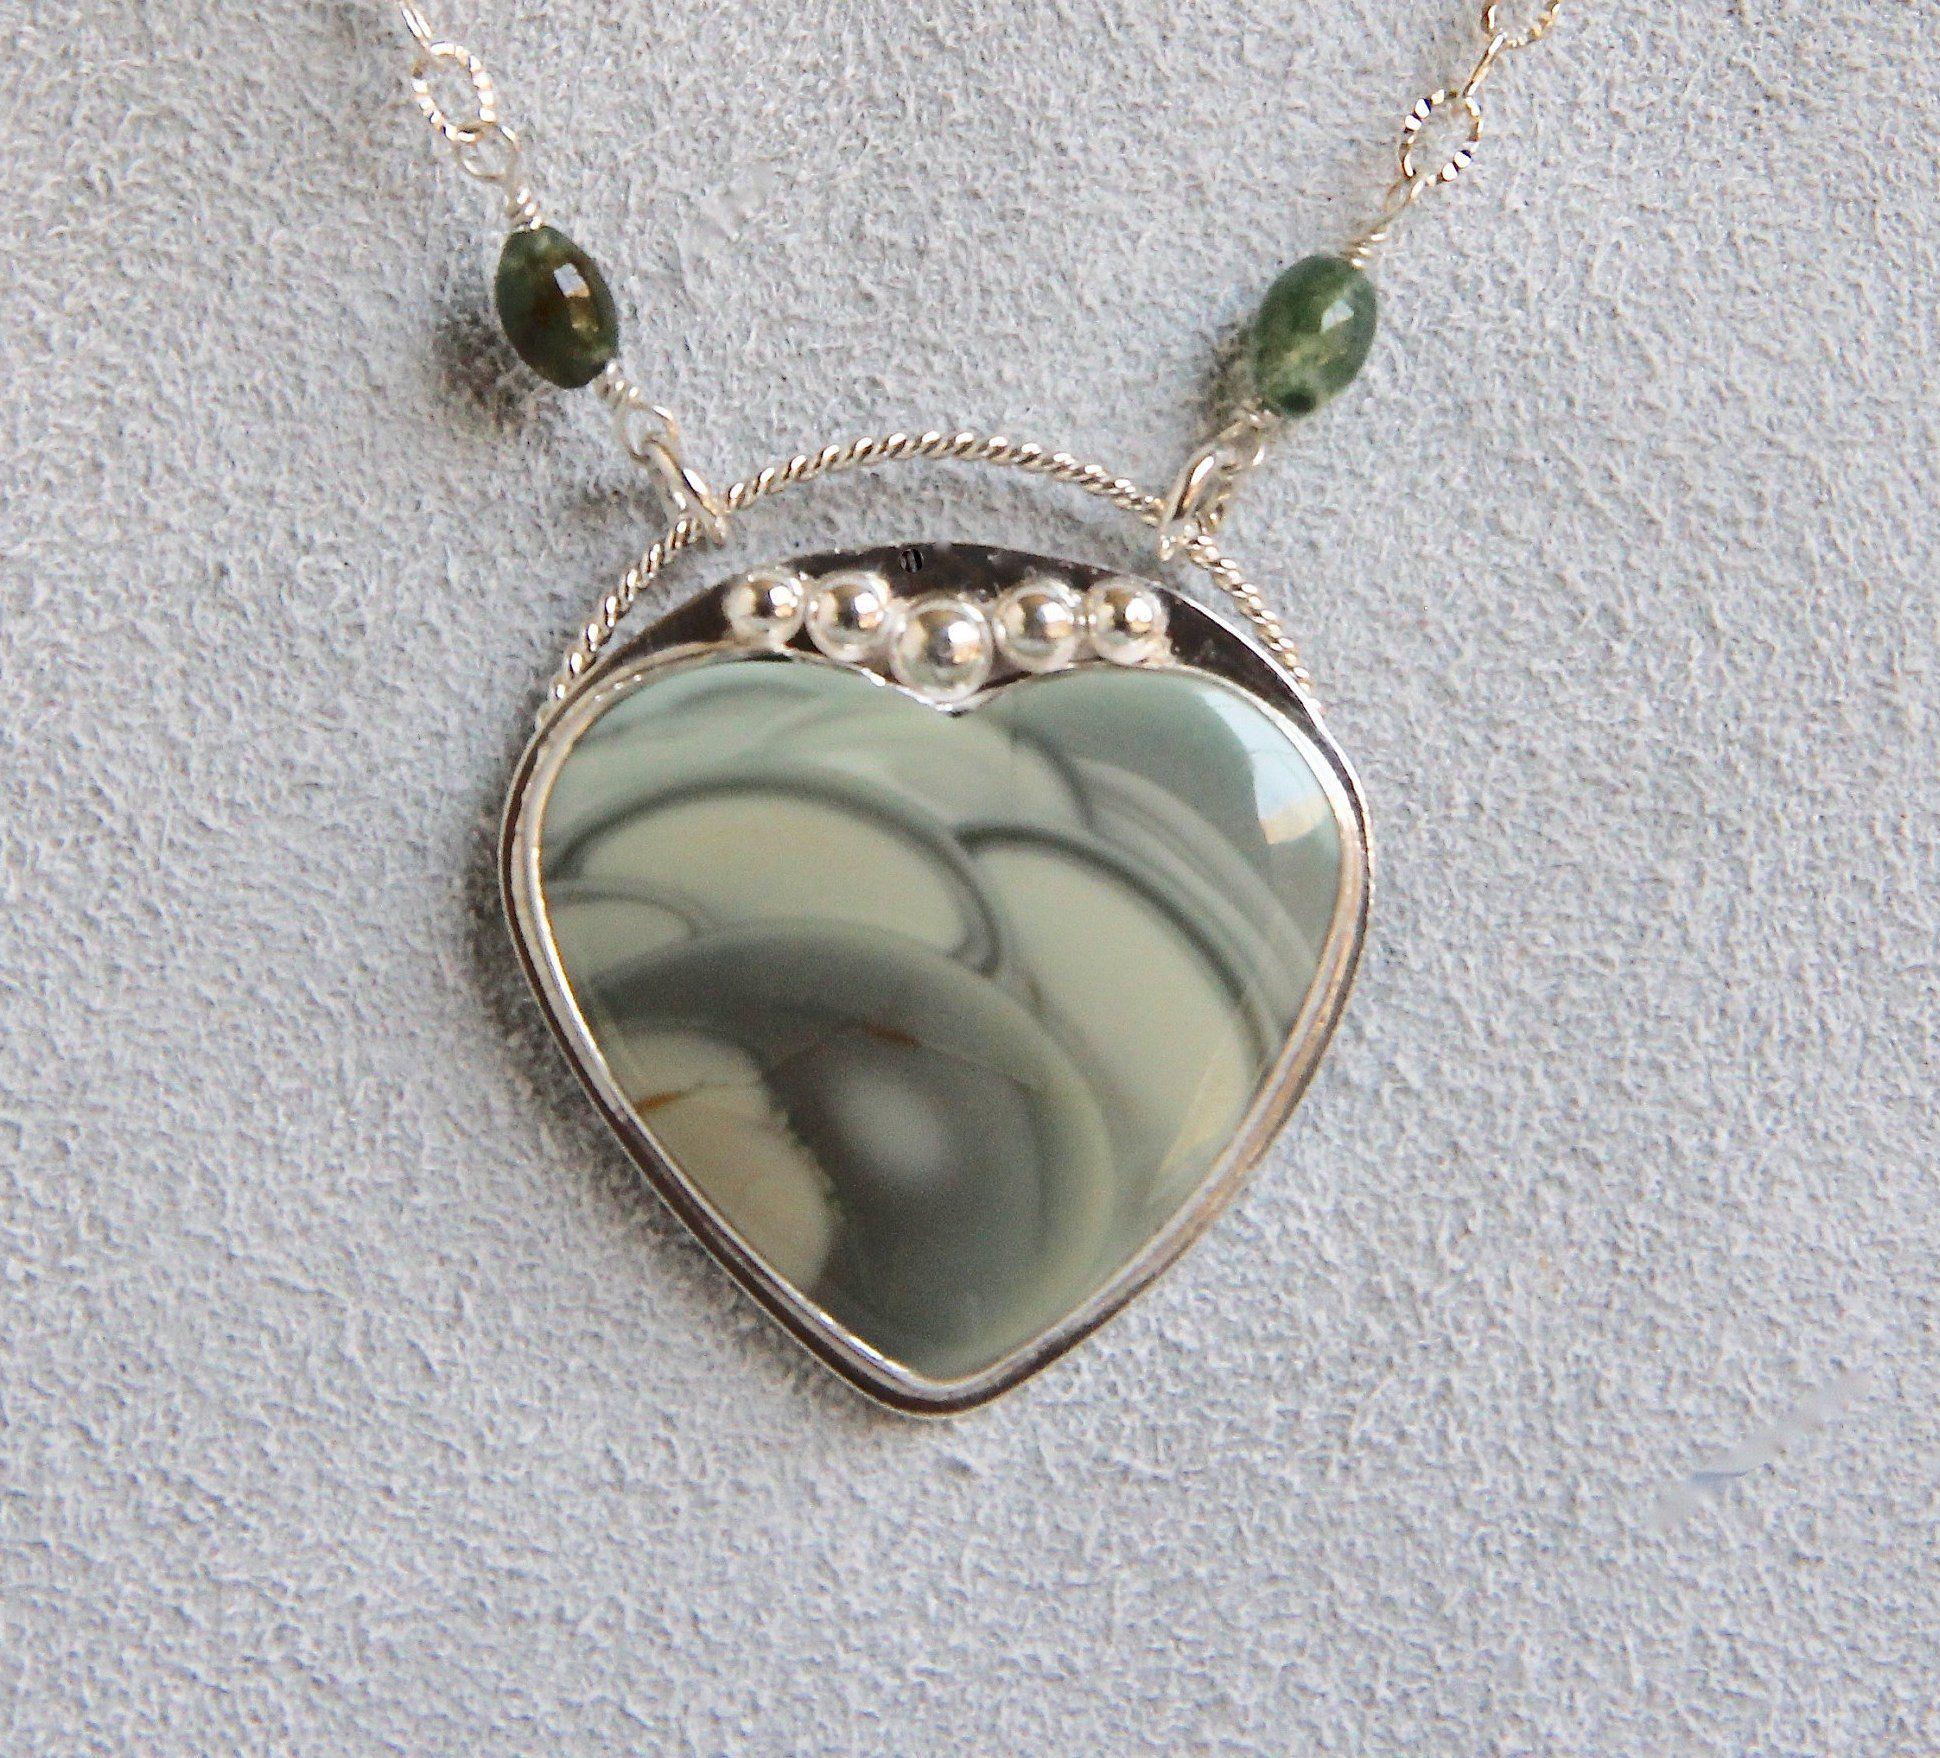 Imperial jasper heart cabochon pendant necklace silver bezel set